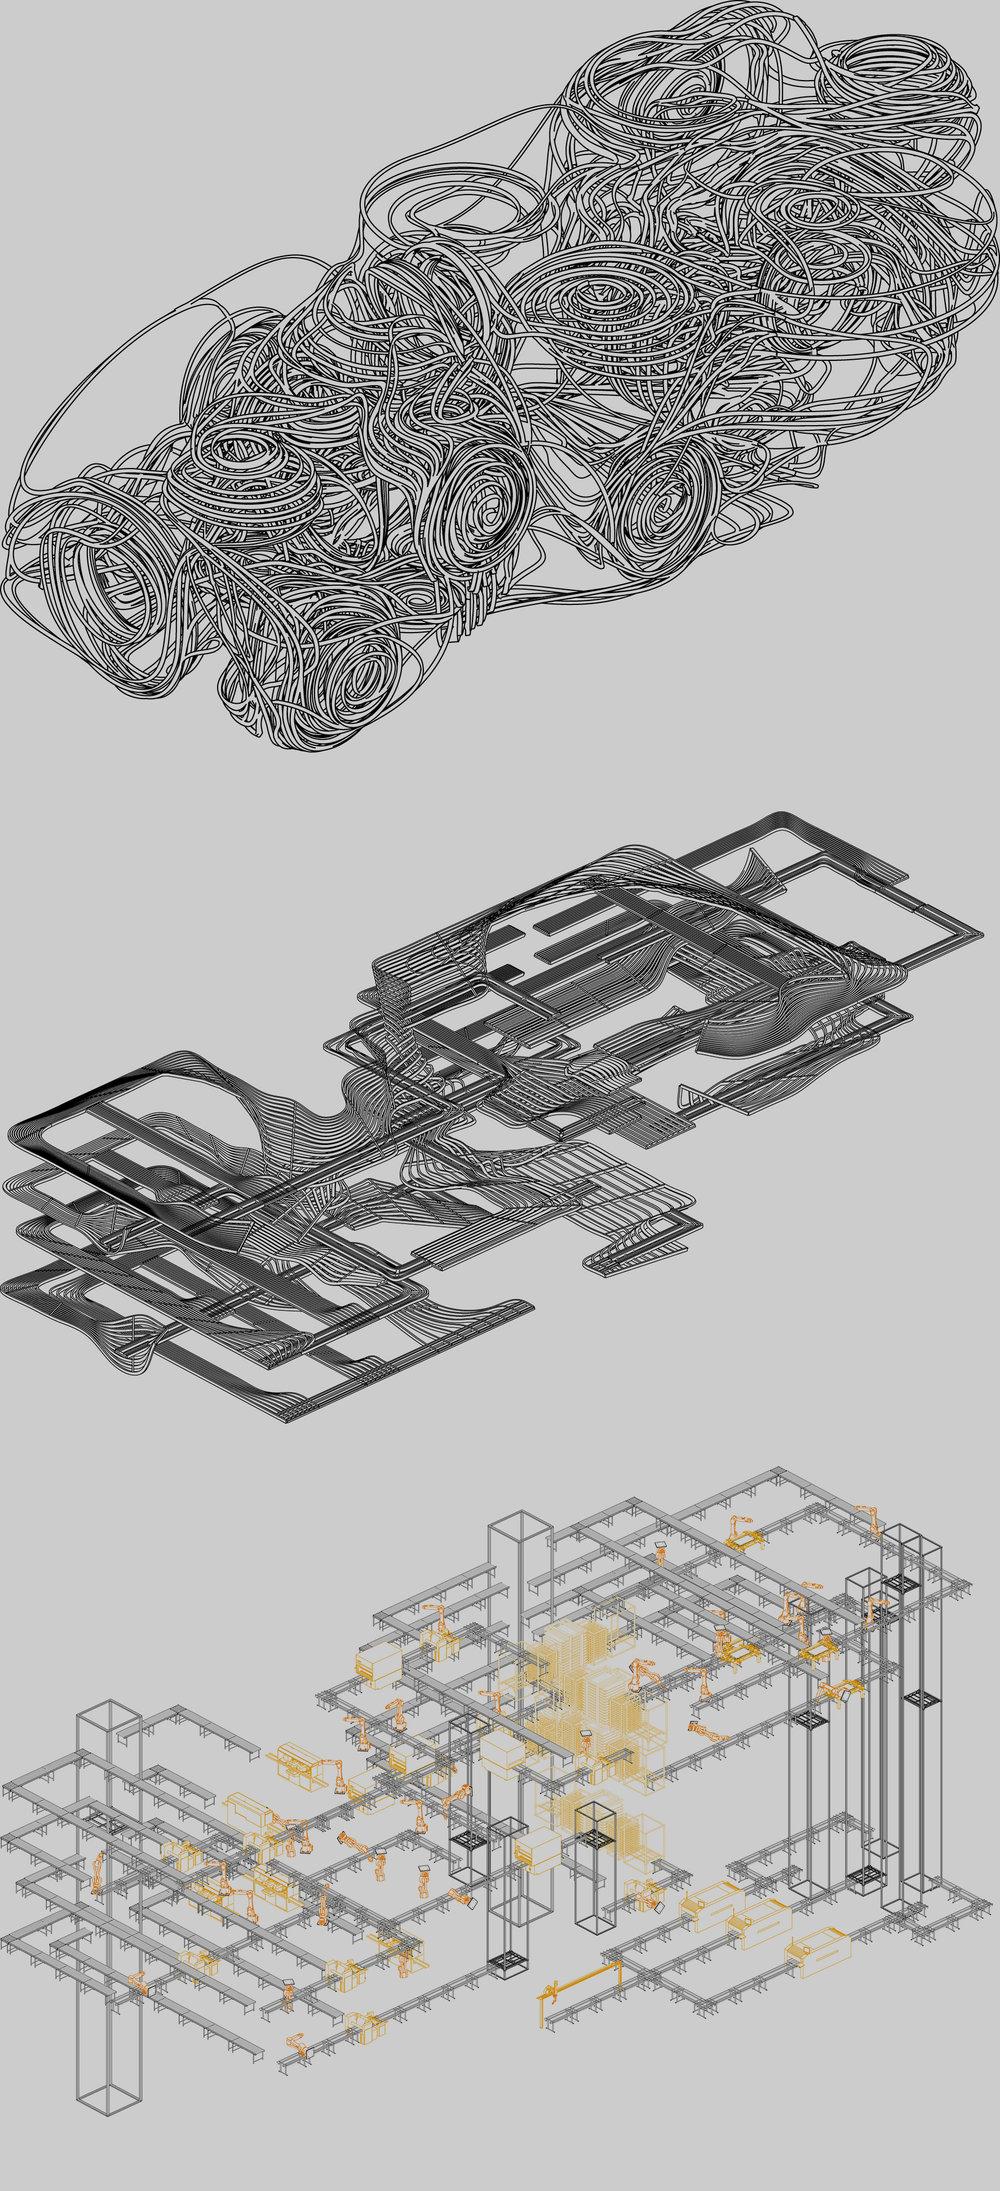 Web_machinespectacle_alexandramoisi_adrianherk_floriansmutny_axo_ws15 grey.jpg